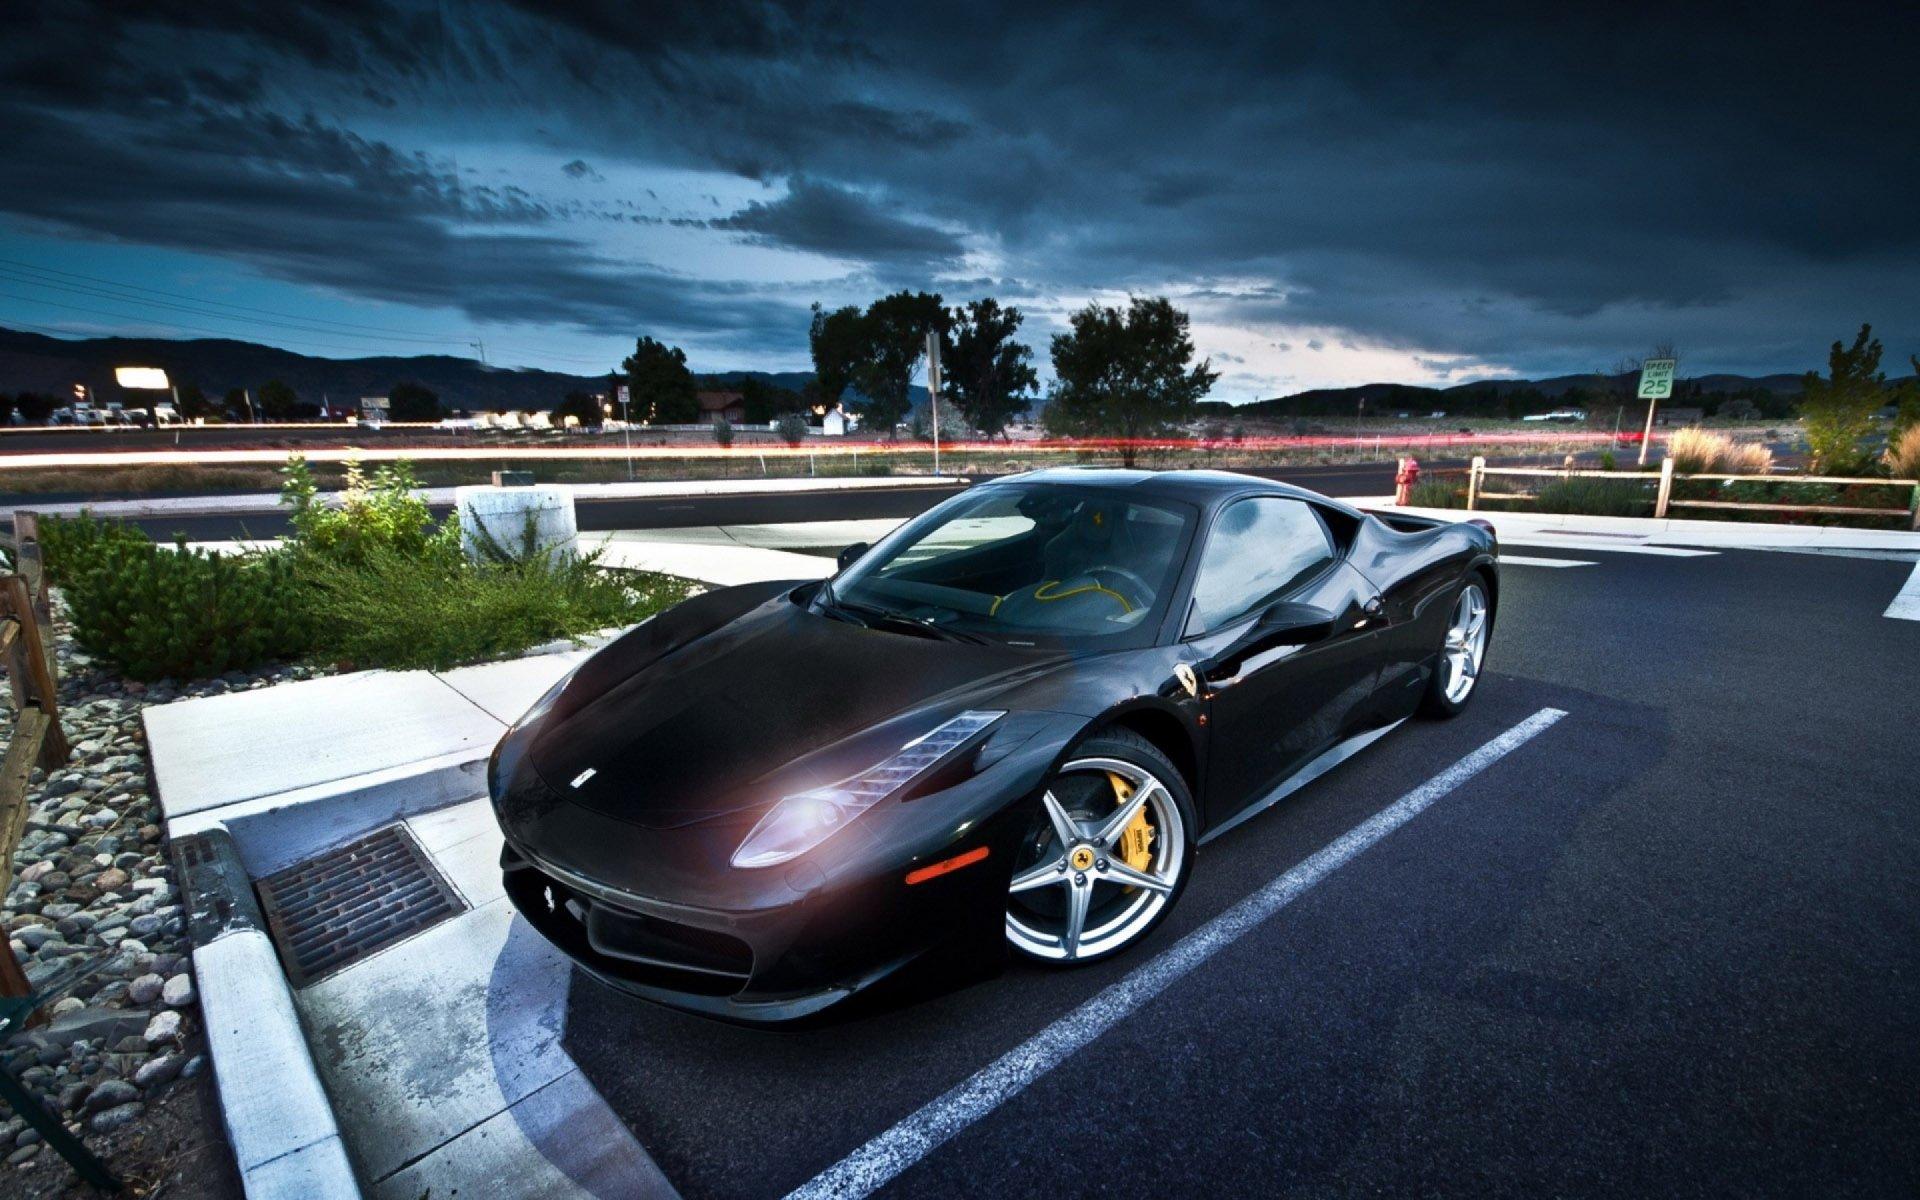 Vehicles - Ferrari 458 Italia  Wallpaper